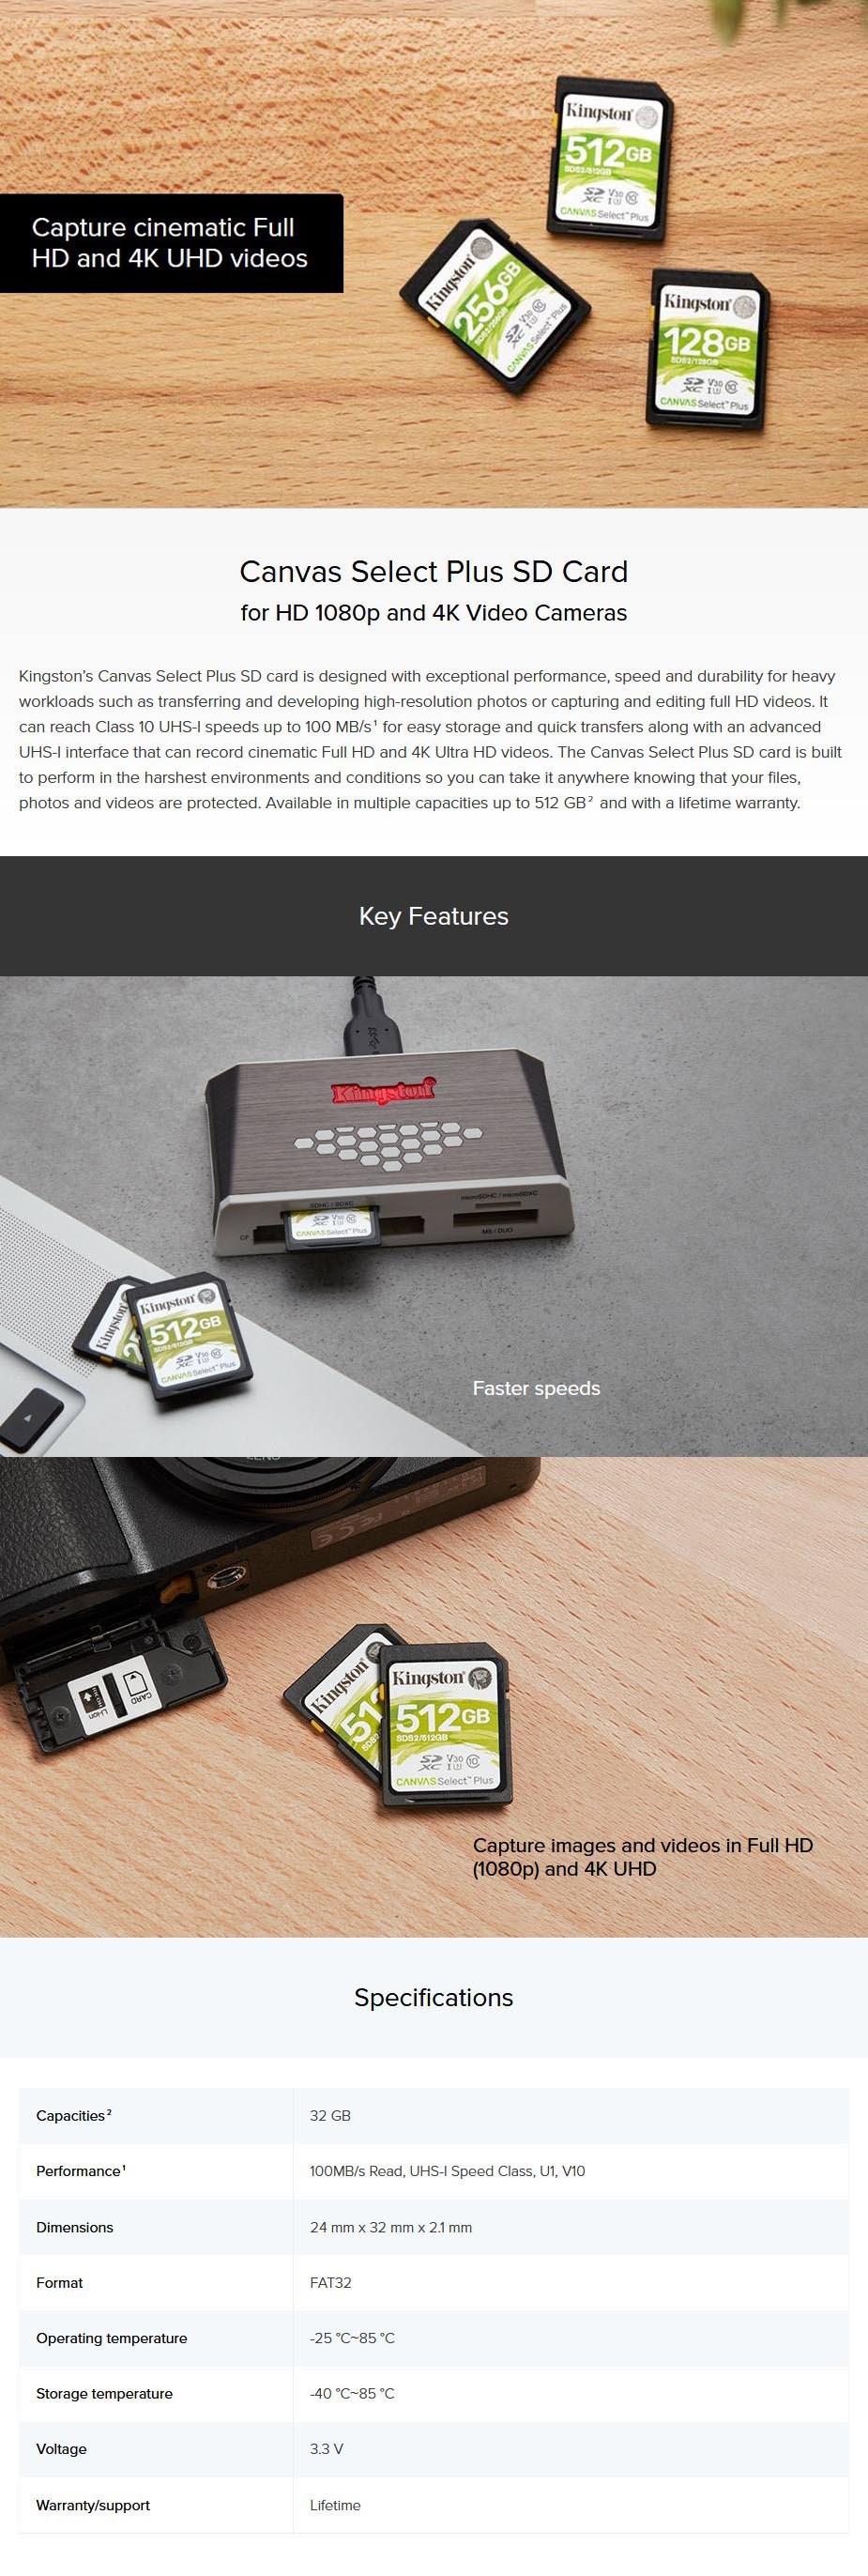 kingston-32gb-canvas-afselect-plus-sdhc-uhsi-class-10-memory-card-100mbs-ac36221-5.jpg